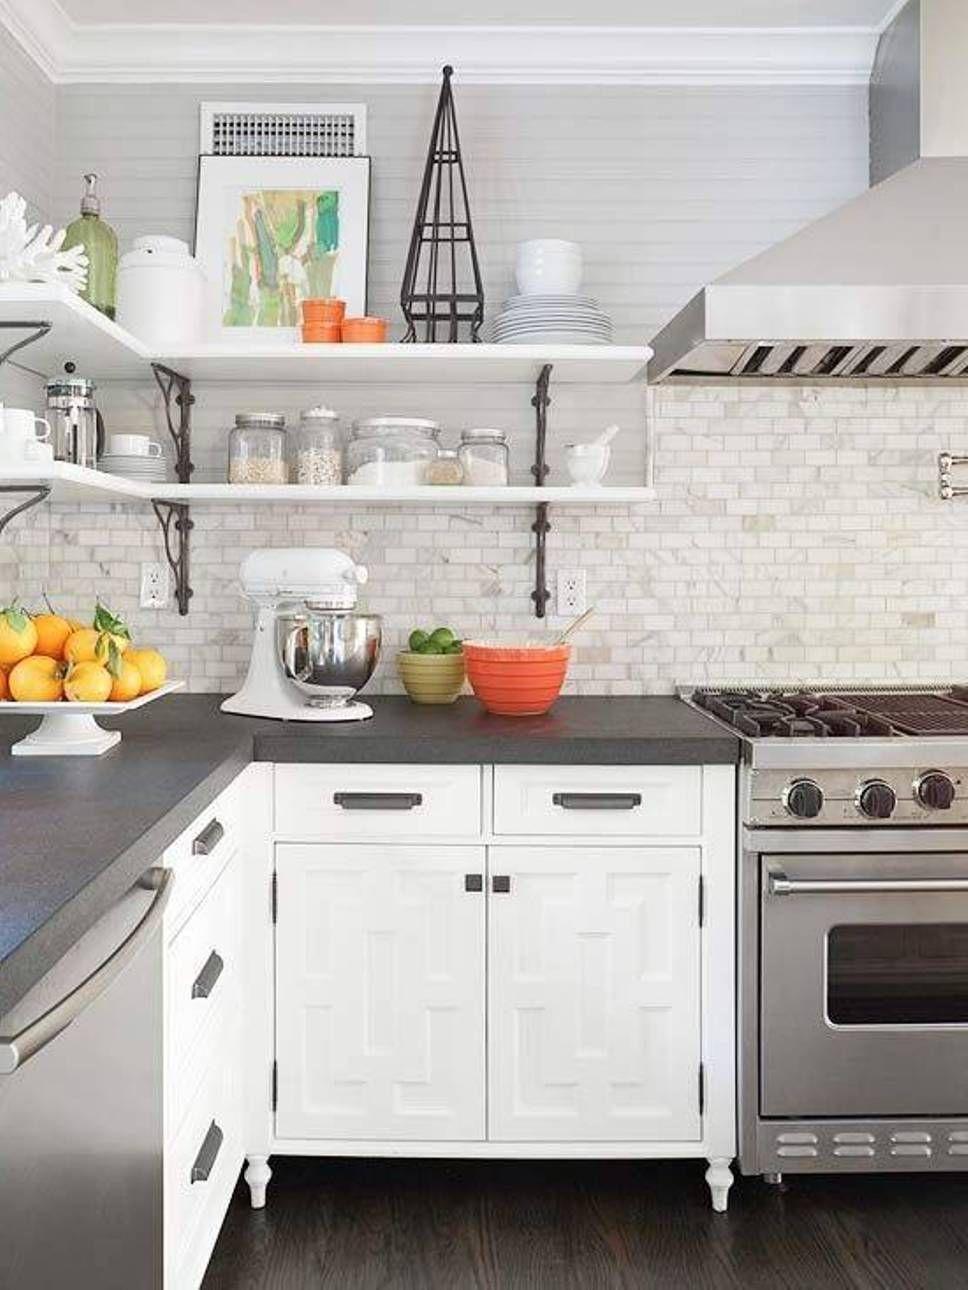 White Kitchen Gray Backsplash Black Counter Decorkeun